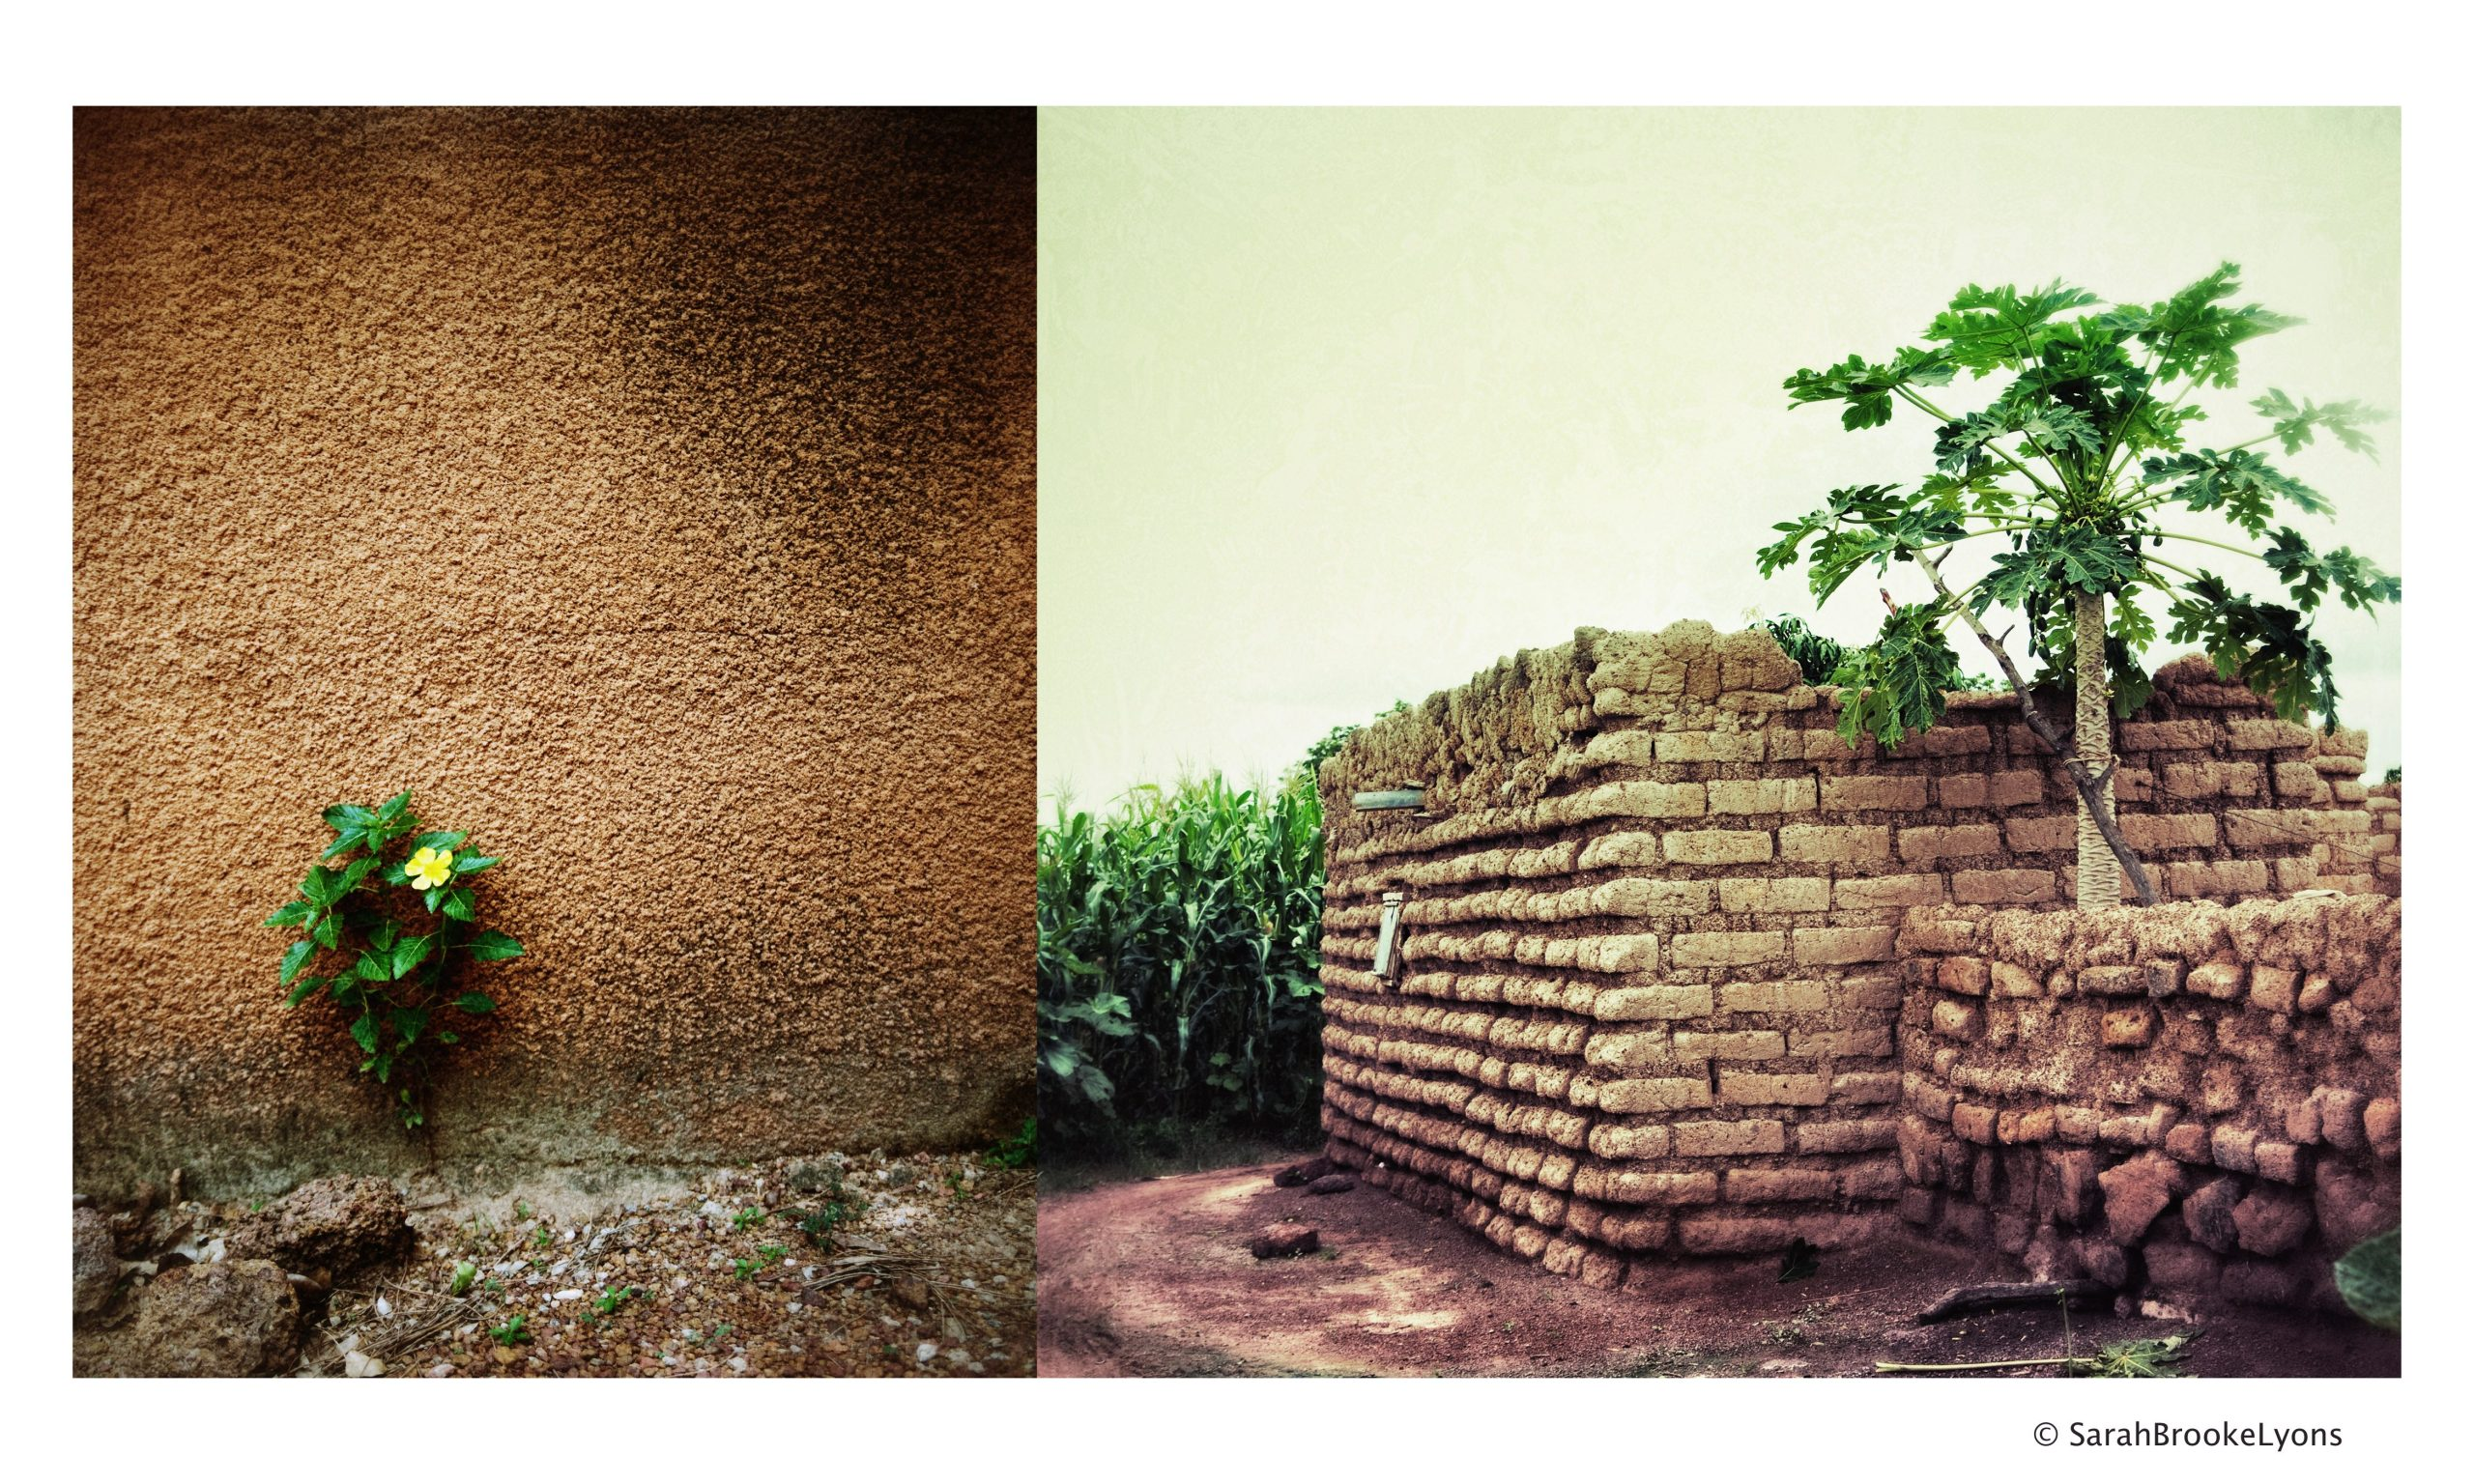 Homes in Burkina Faso. Photo by Sarah Brooke Lyons.